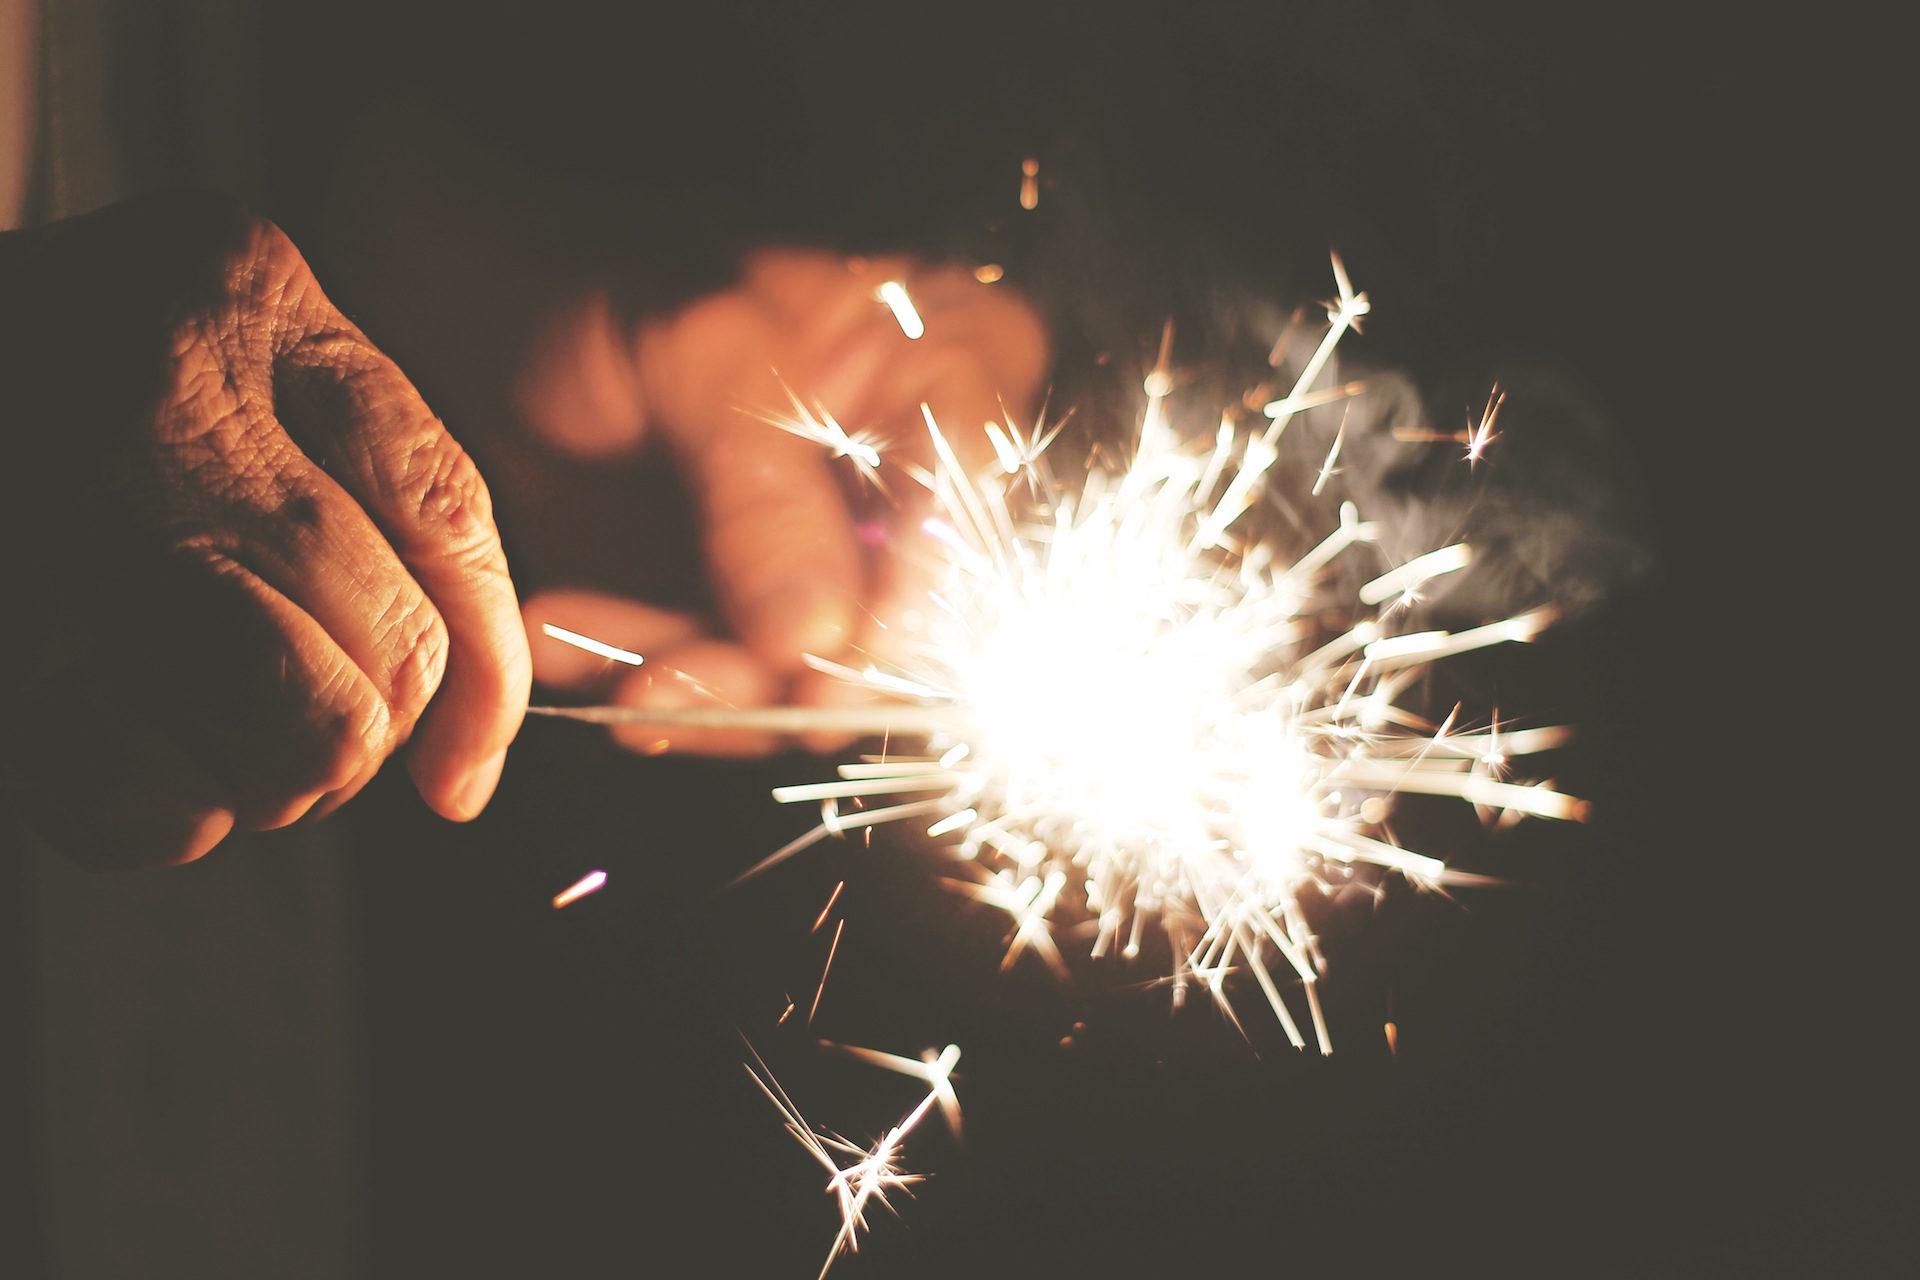 mains, rides, Bengal, Sparks, lumière - Fonds d'écran HD - Professor-falken.com